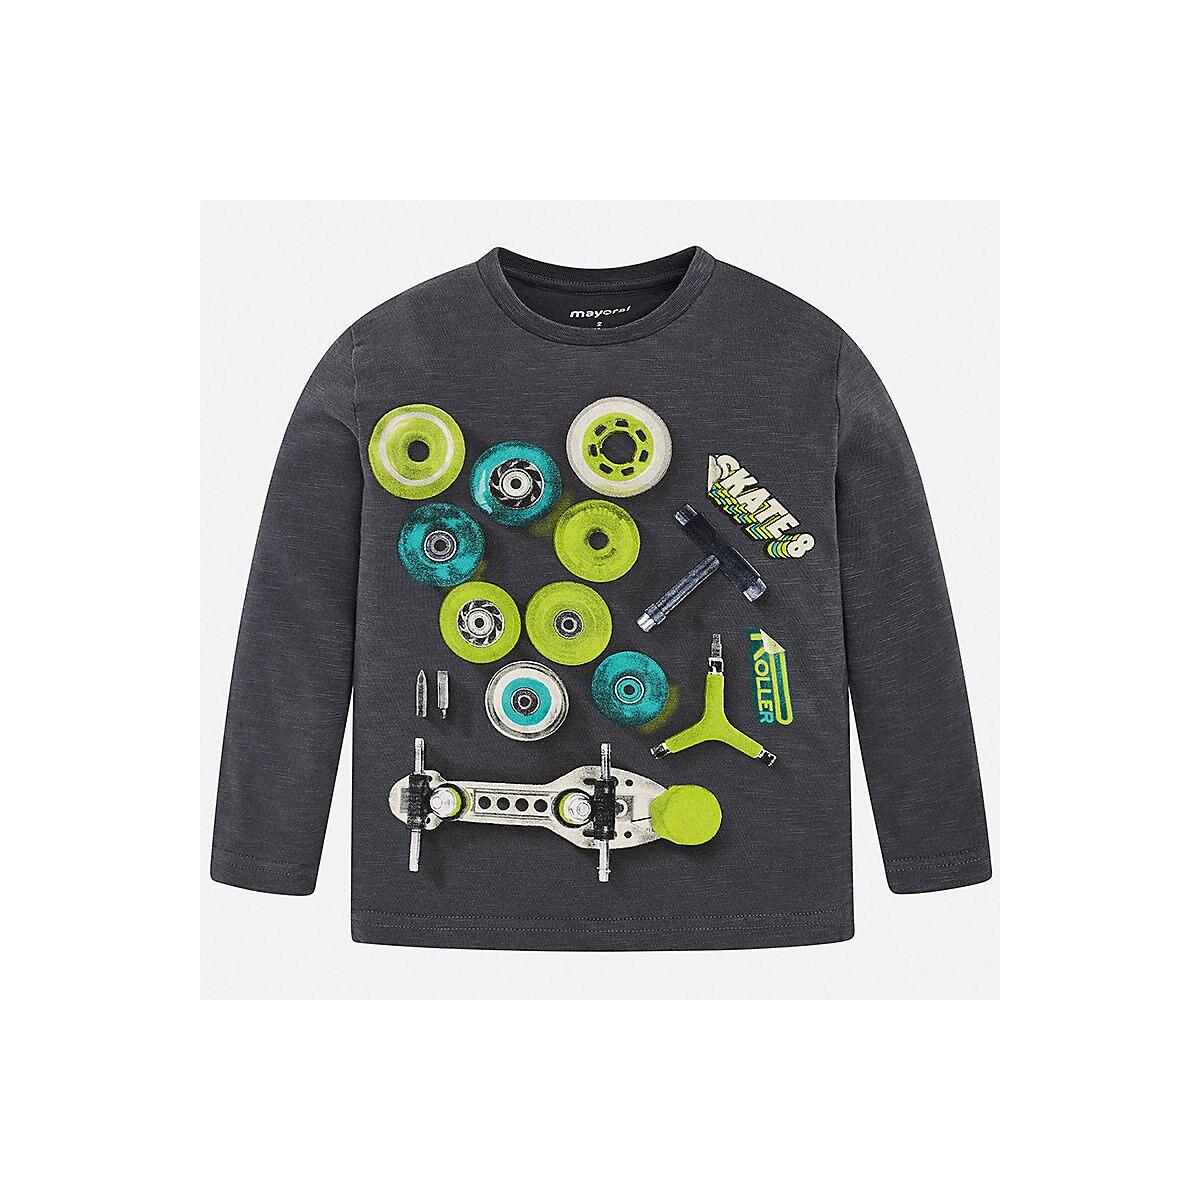 MAYORAL Blouses & Shirts 8848989 Boys Cotton  clothes baby boy children child wear blouses